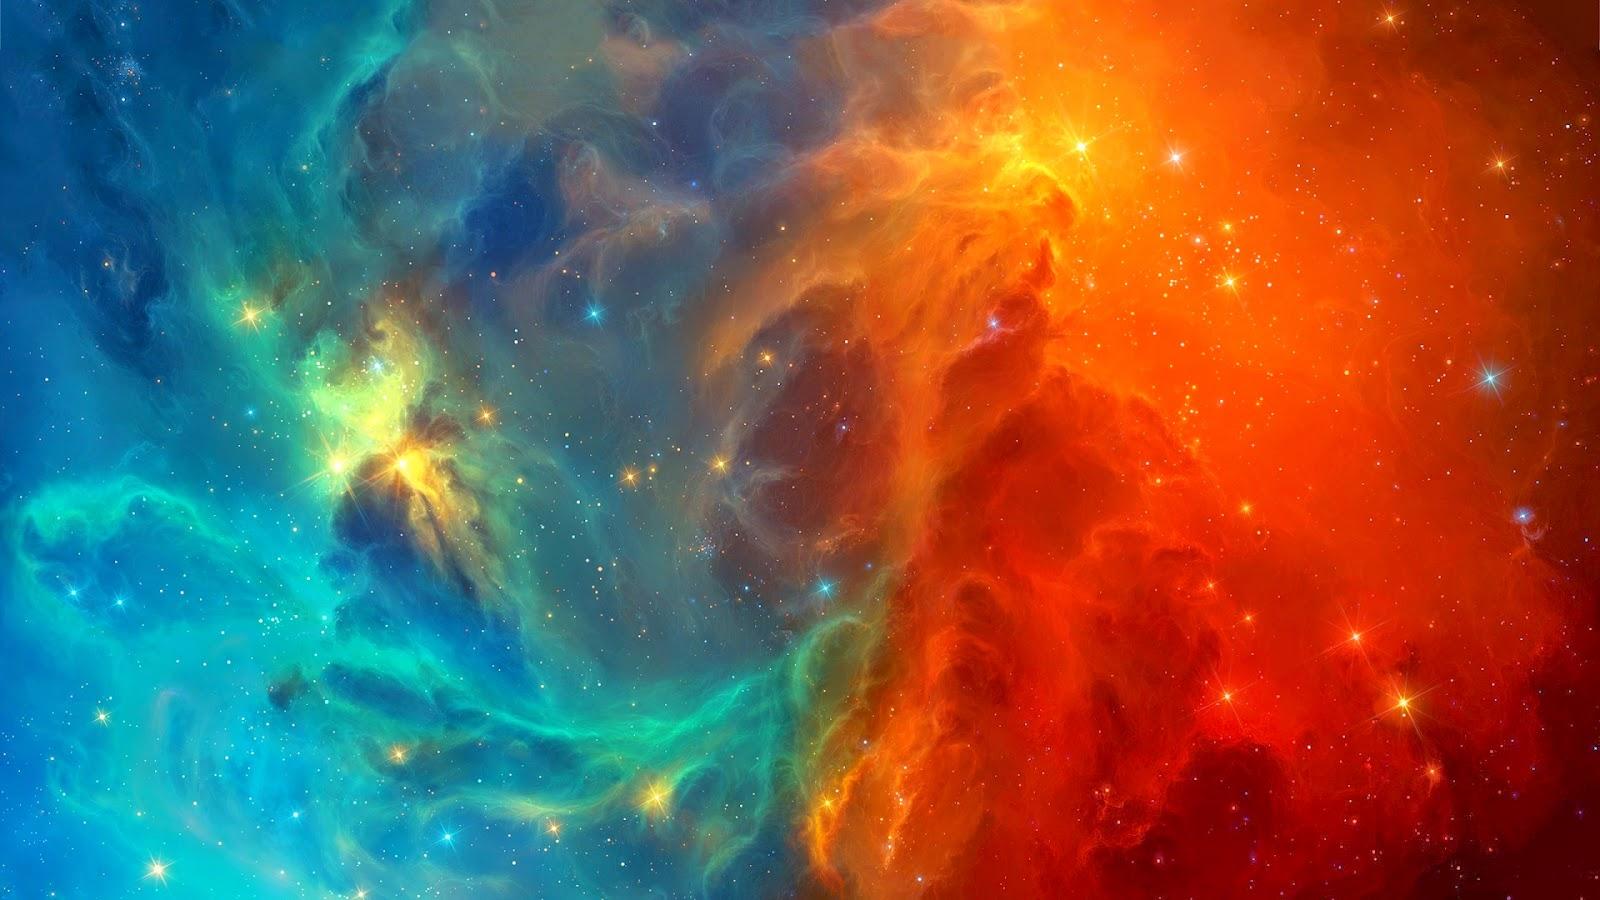 WALLPAPER ANDROID - IPHONE: 10 Wallpaper Nebula 1920x1080